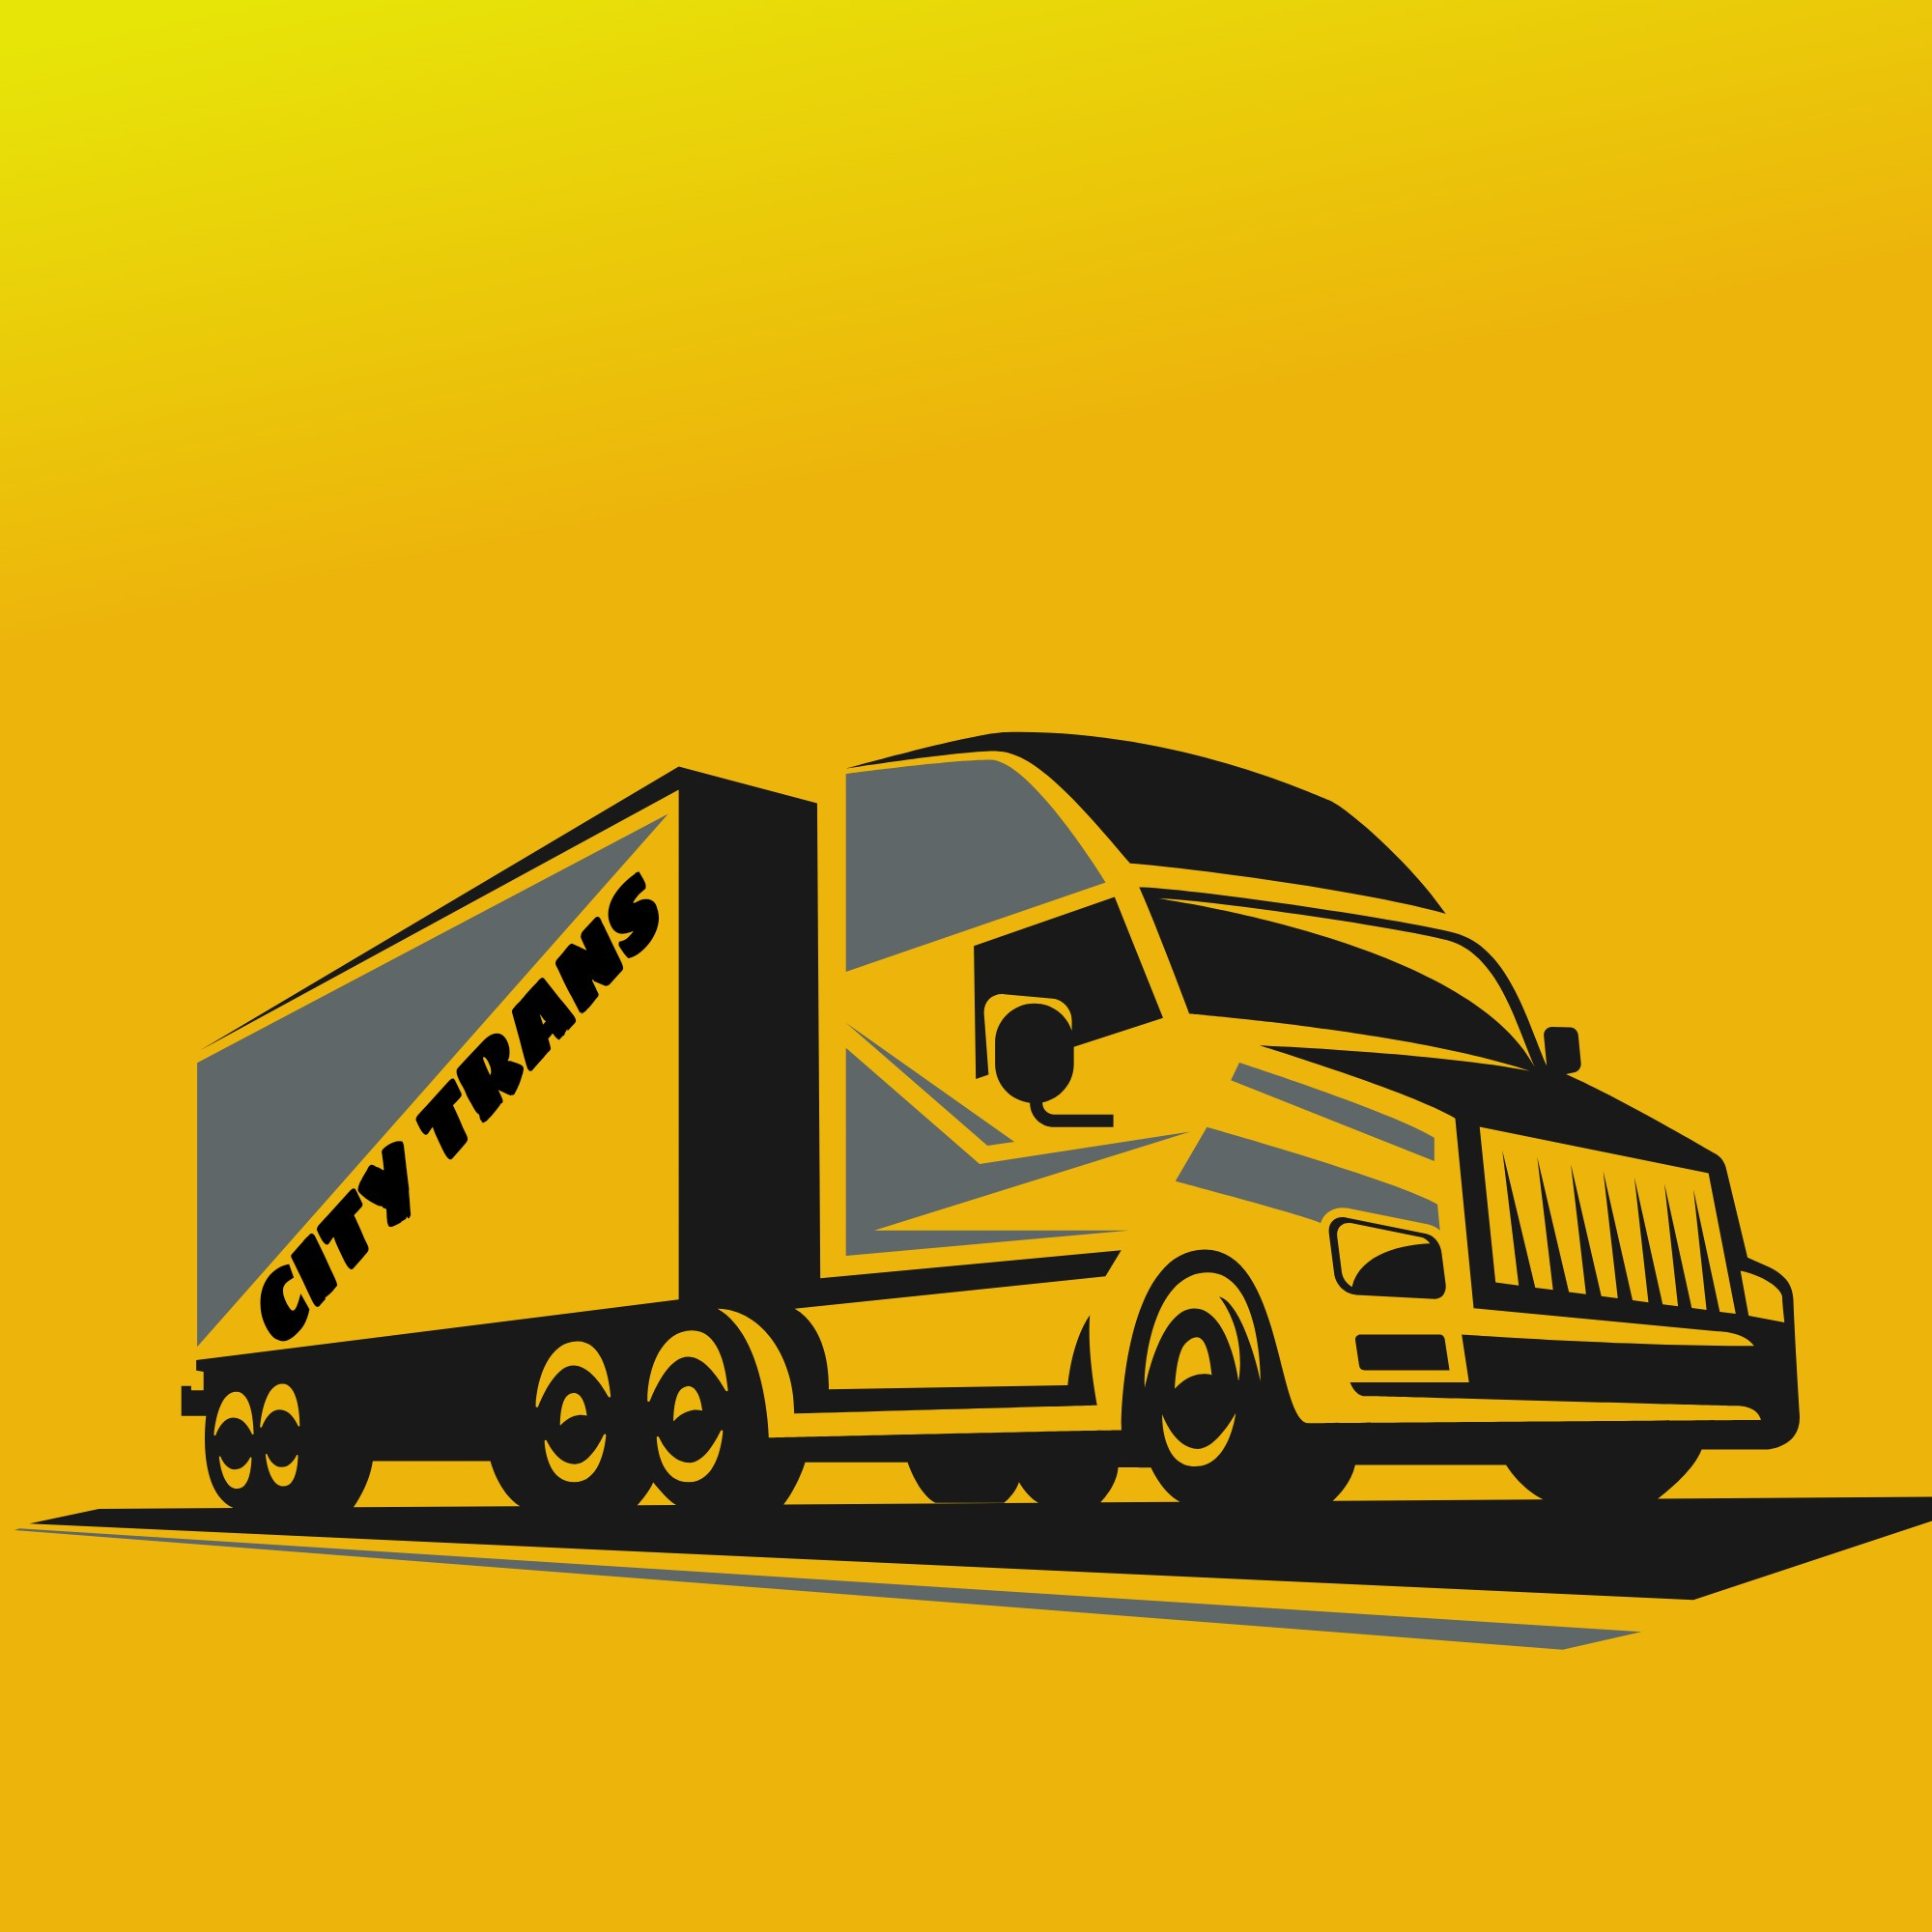 Разработка Логотипа транспортной компании фото f_0915e6ceafa319ab.jpg